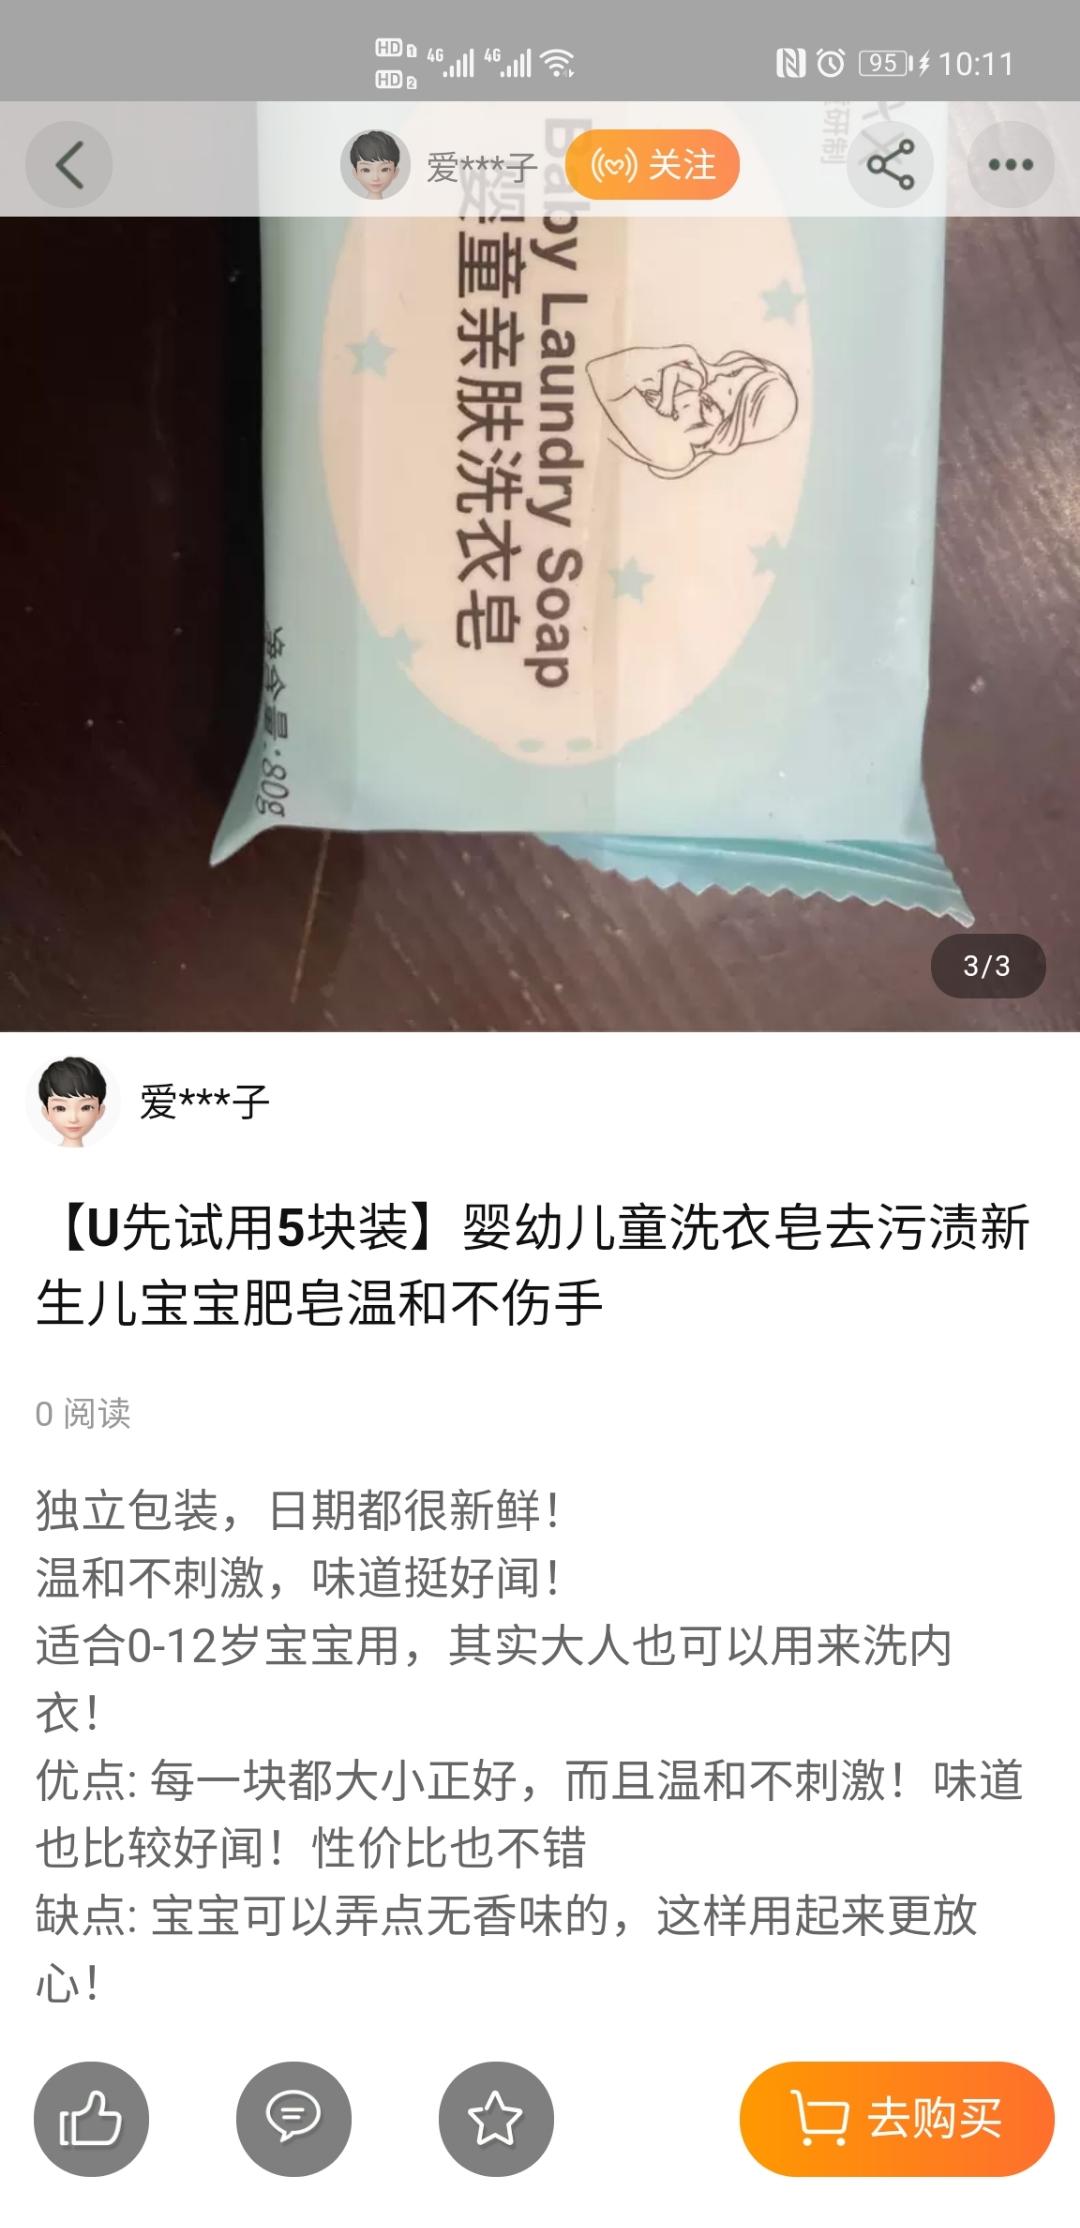 Screenshot_20210302_101138_com.taobao.taobao.jpg